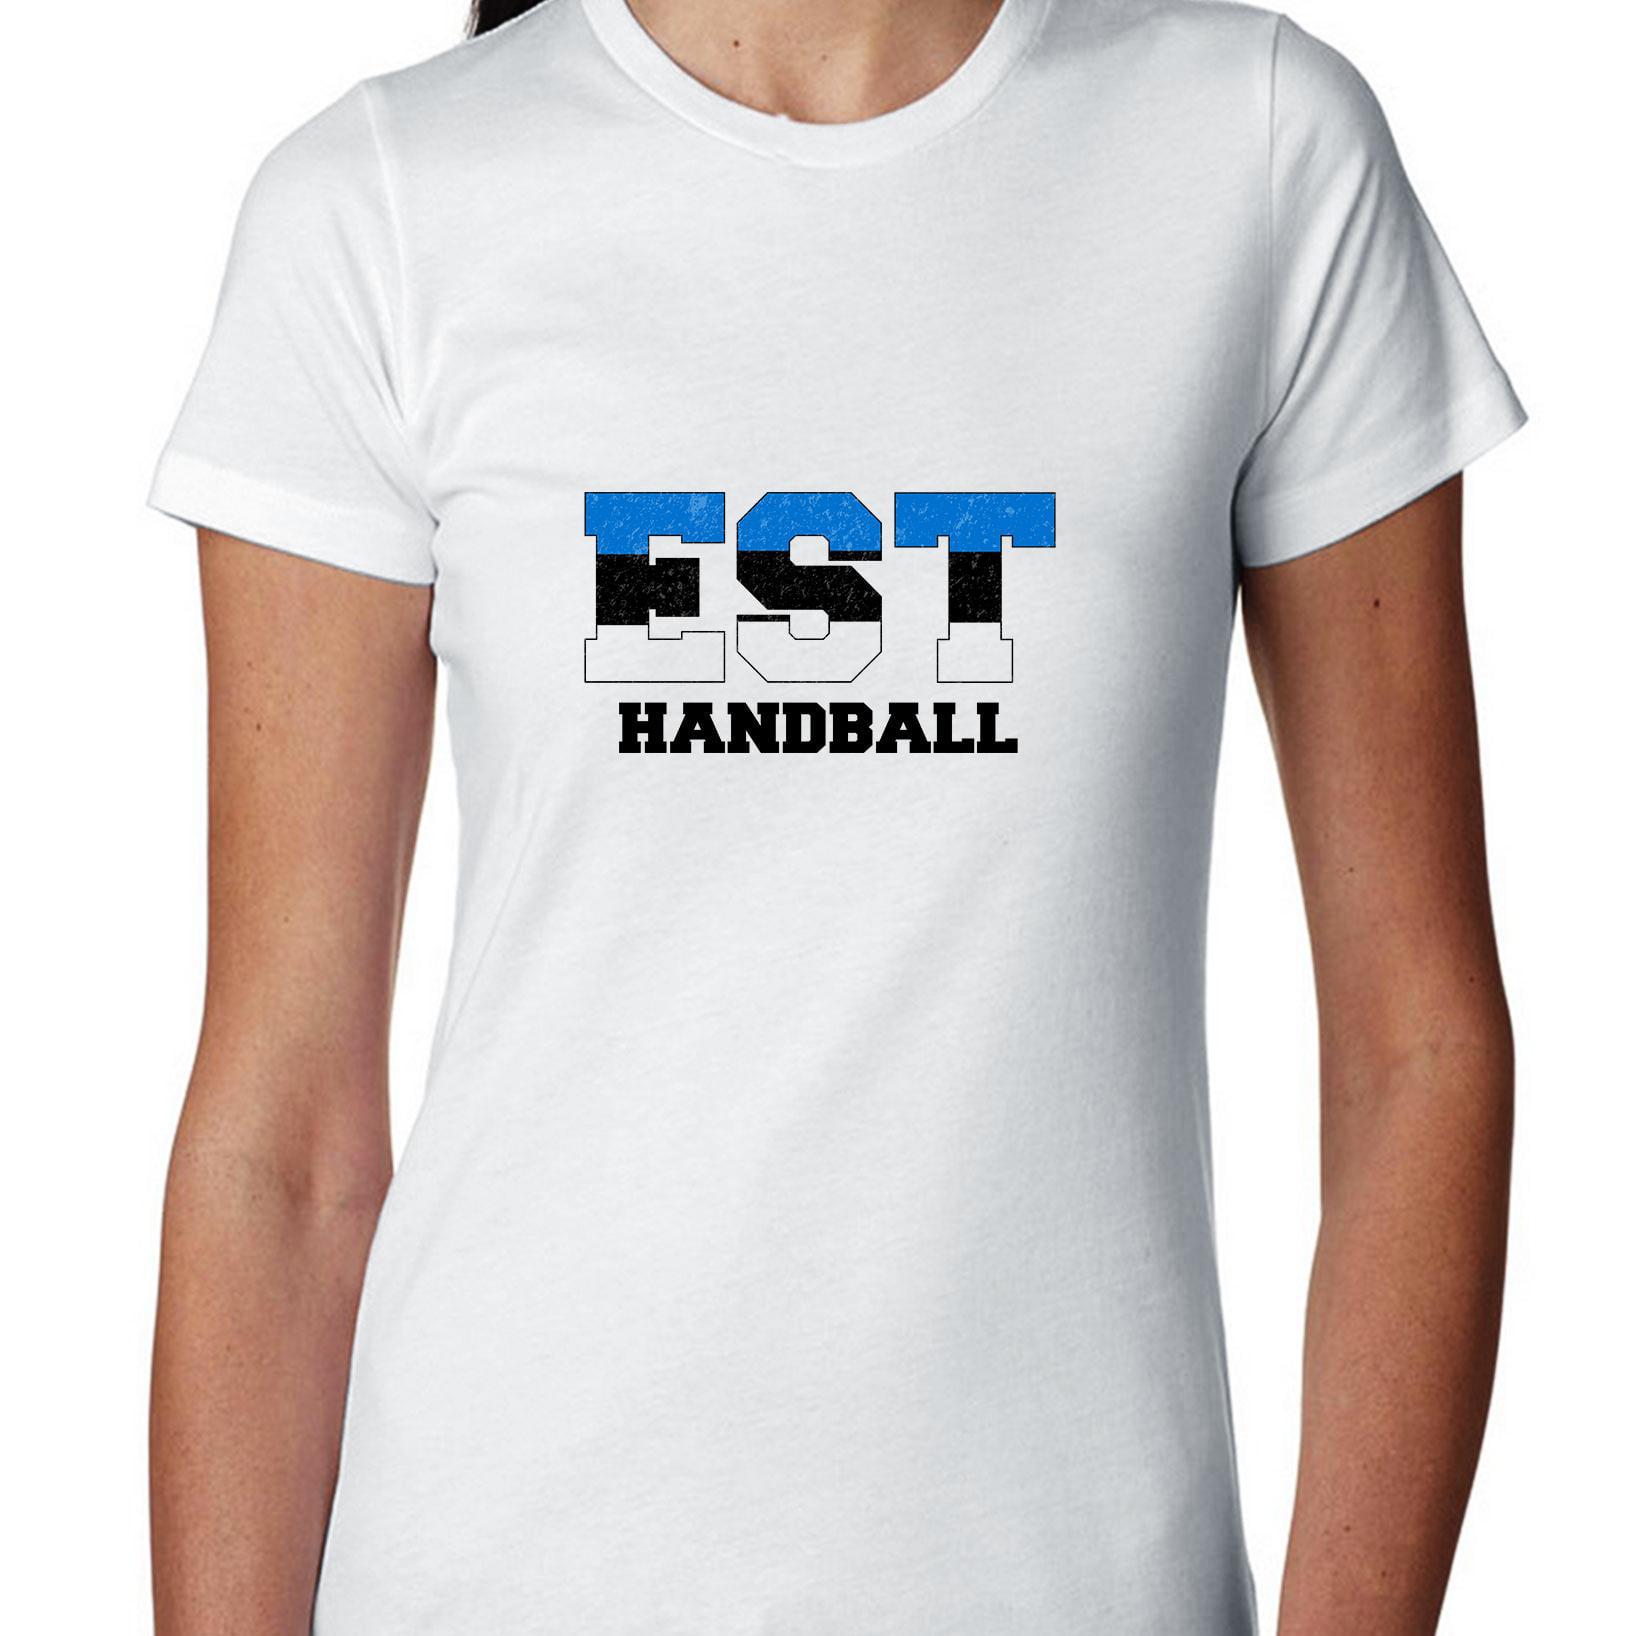 Estonia Handball Olympic Games Rio Flag Women's Cotton T-Shirt by Hollywood Thread